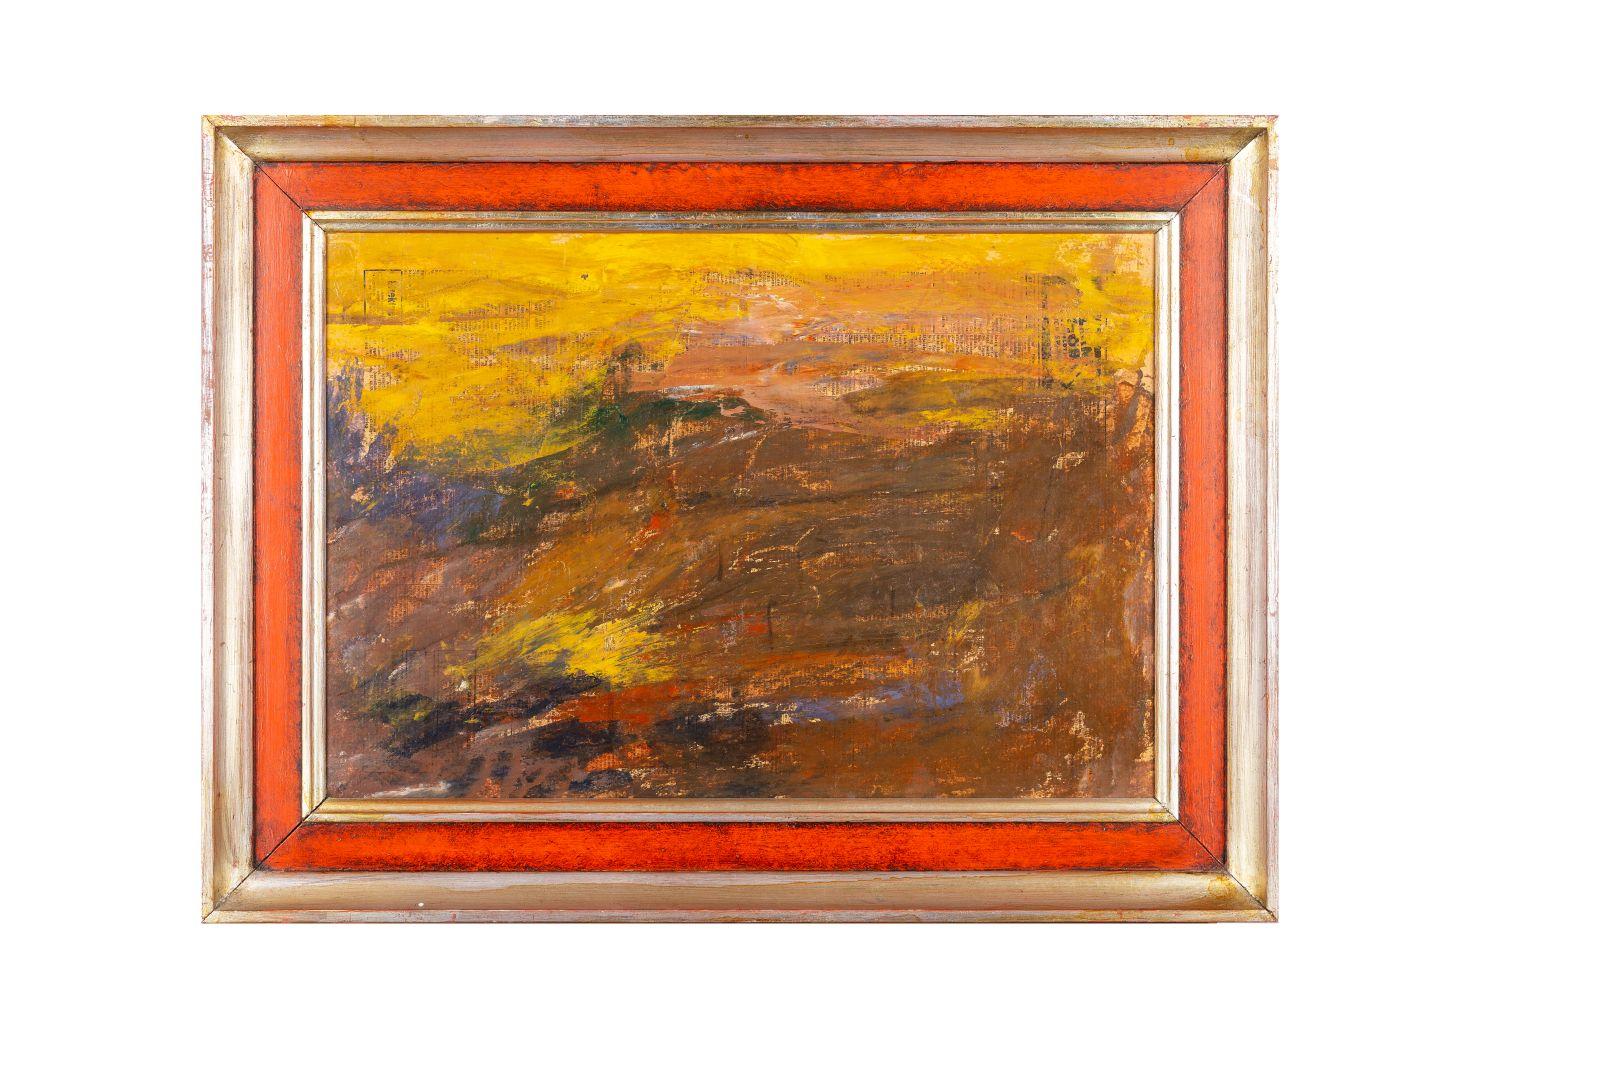 "#92 Leon Abramowicz, ""Abstract Landscape"" | Leon Abramowicz, ""Abstrakte Landschaft"" Image"